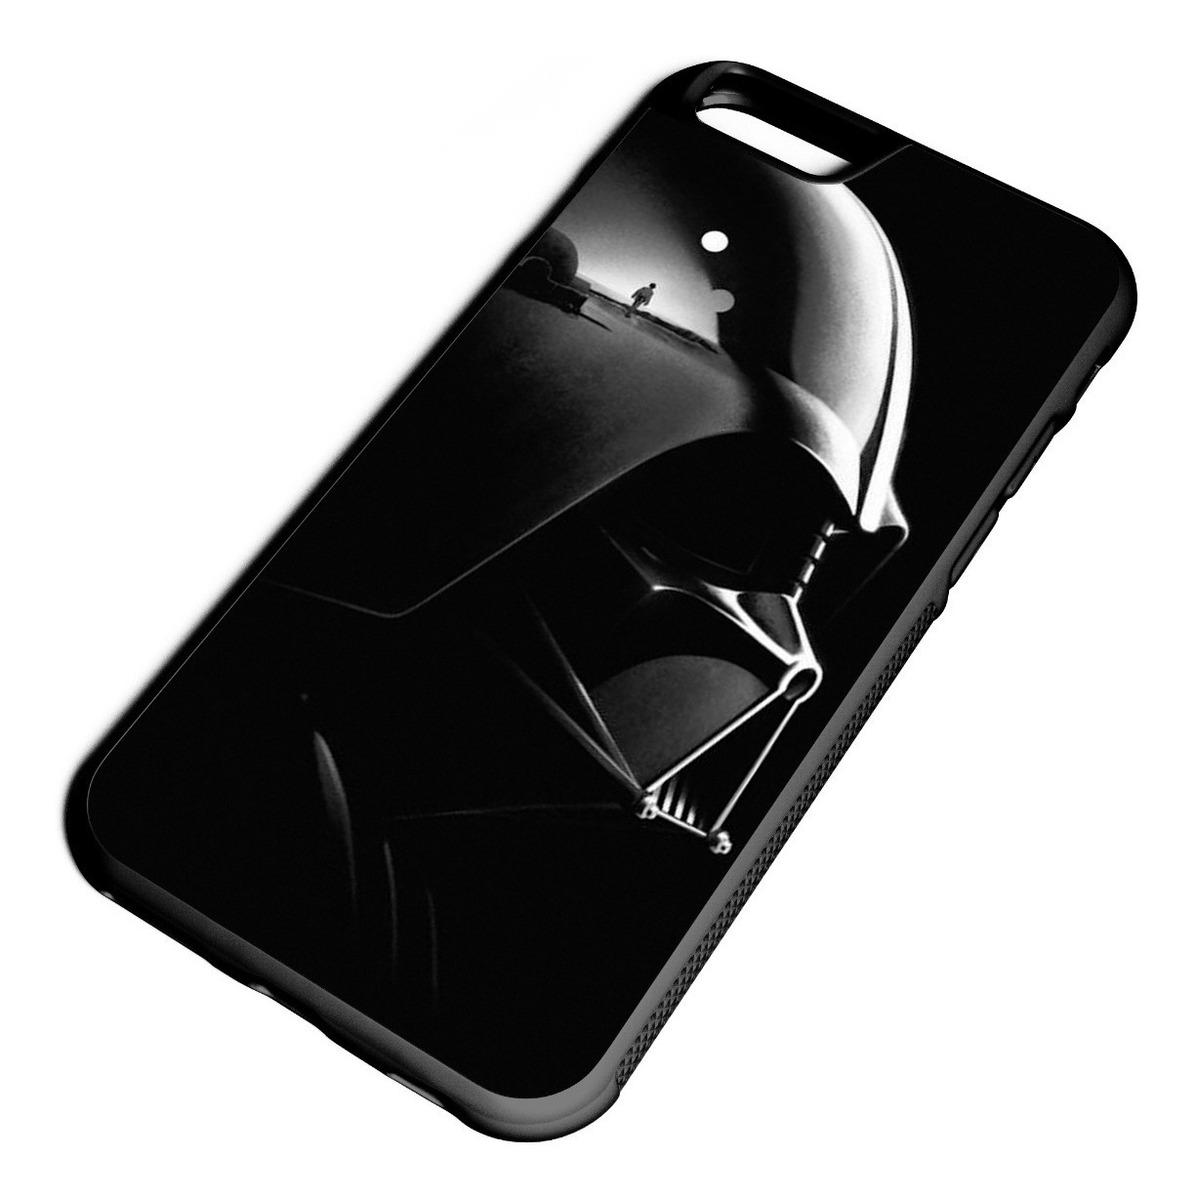 72f5d8ed686 protector funda iphone 6 7 8 x plus - star wars vader 2. Cargando zoom.